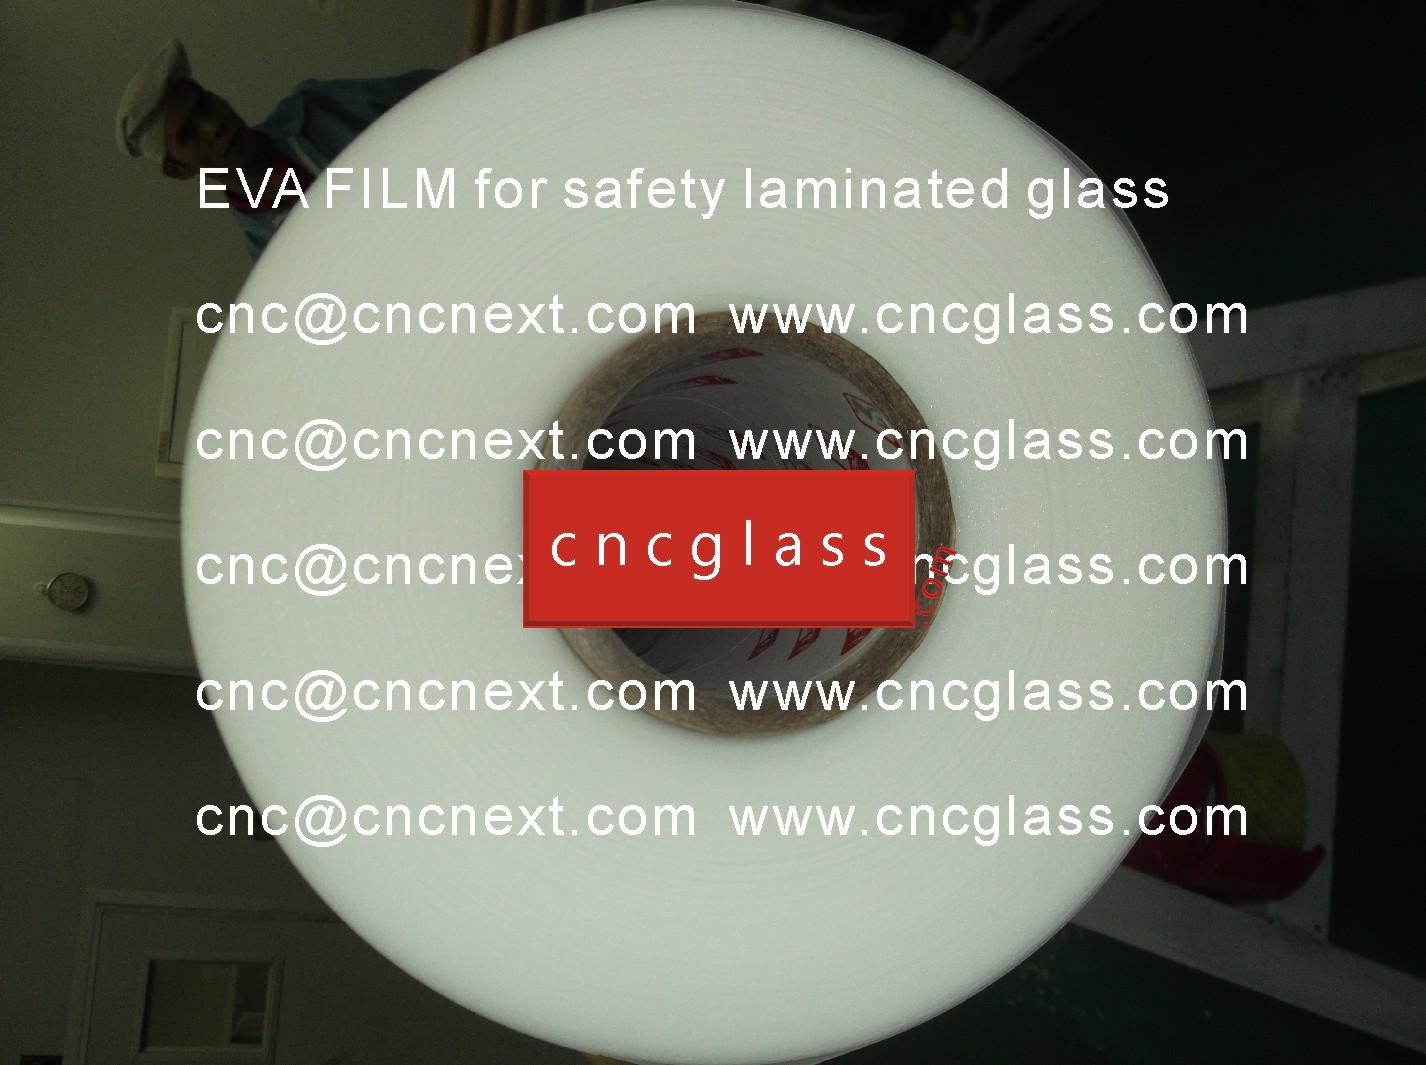 005 EVAFORCE EVA FILM FOR SAFETY LAMINATED GLASS